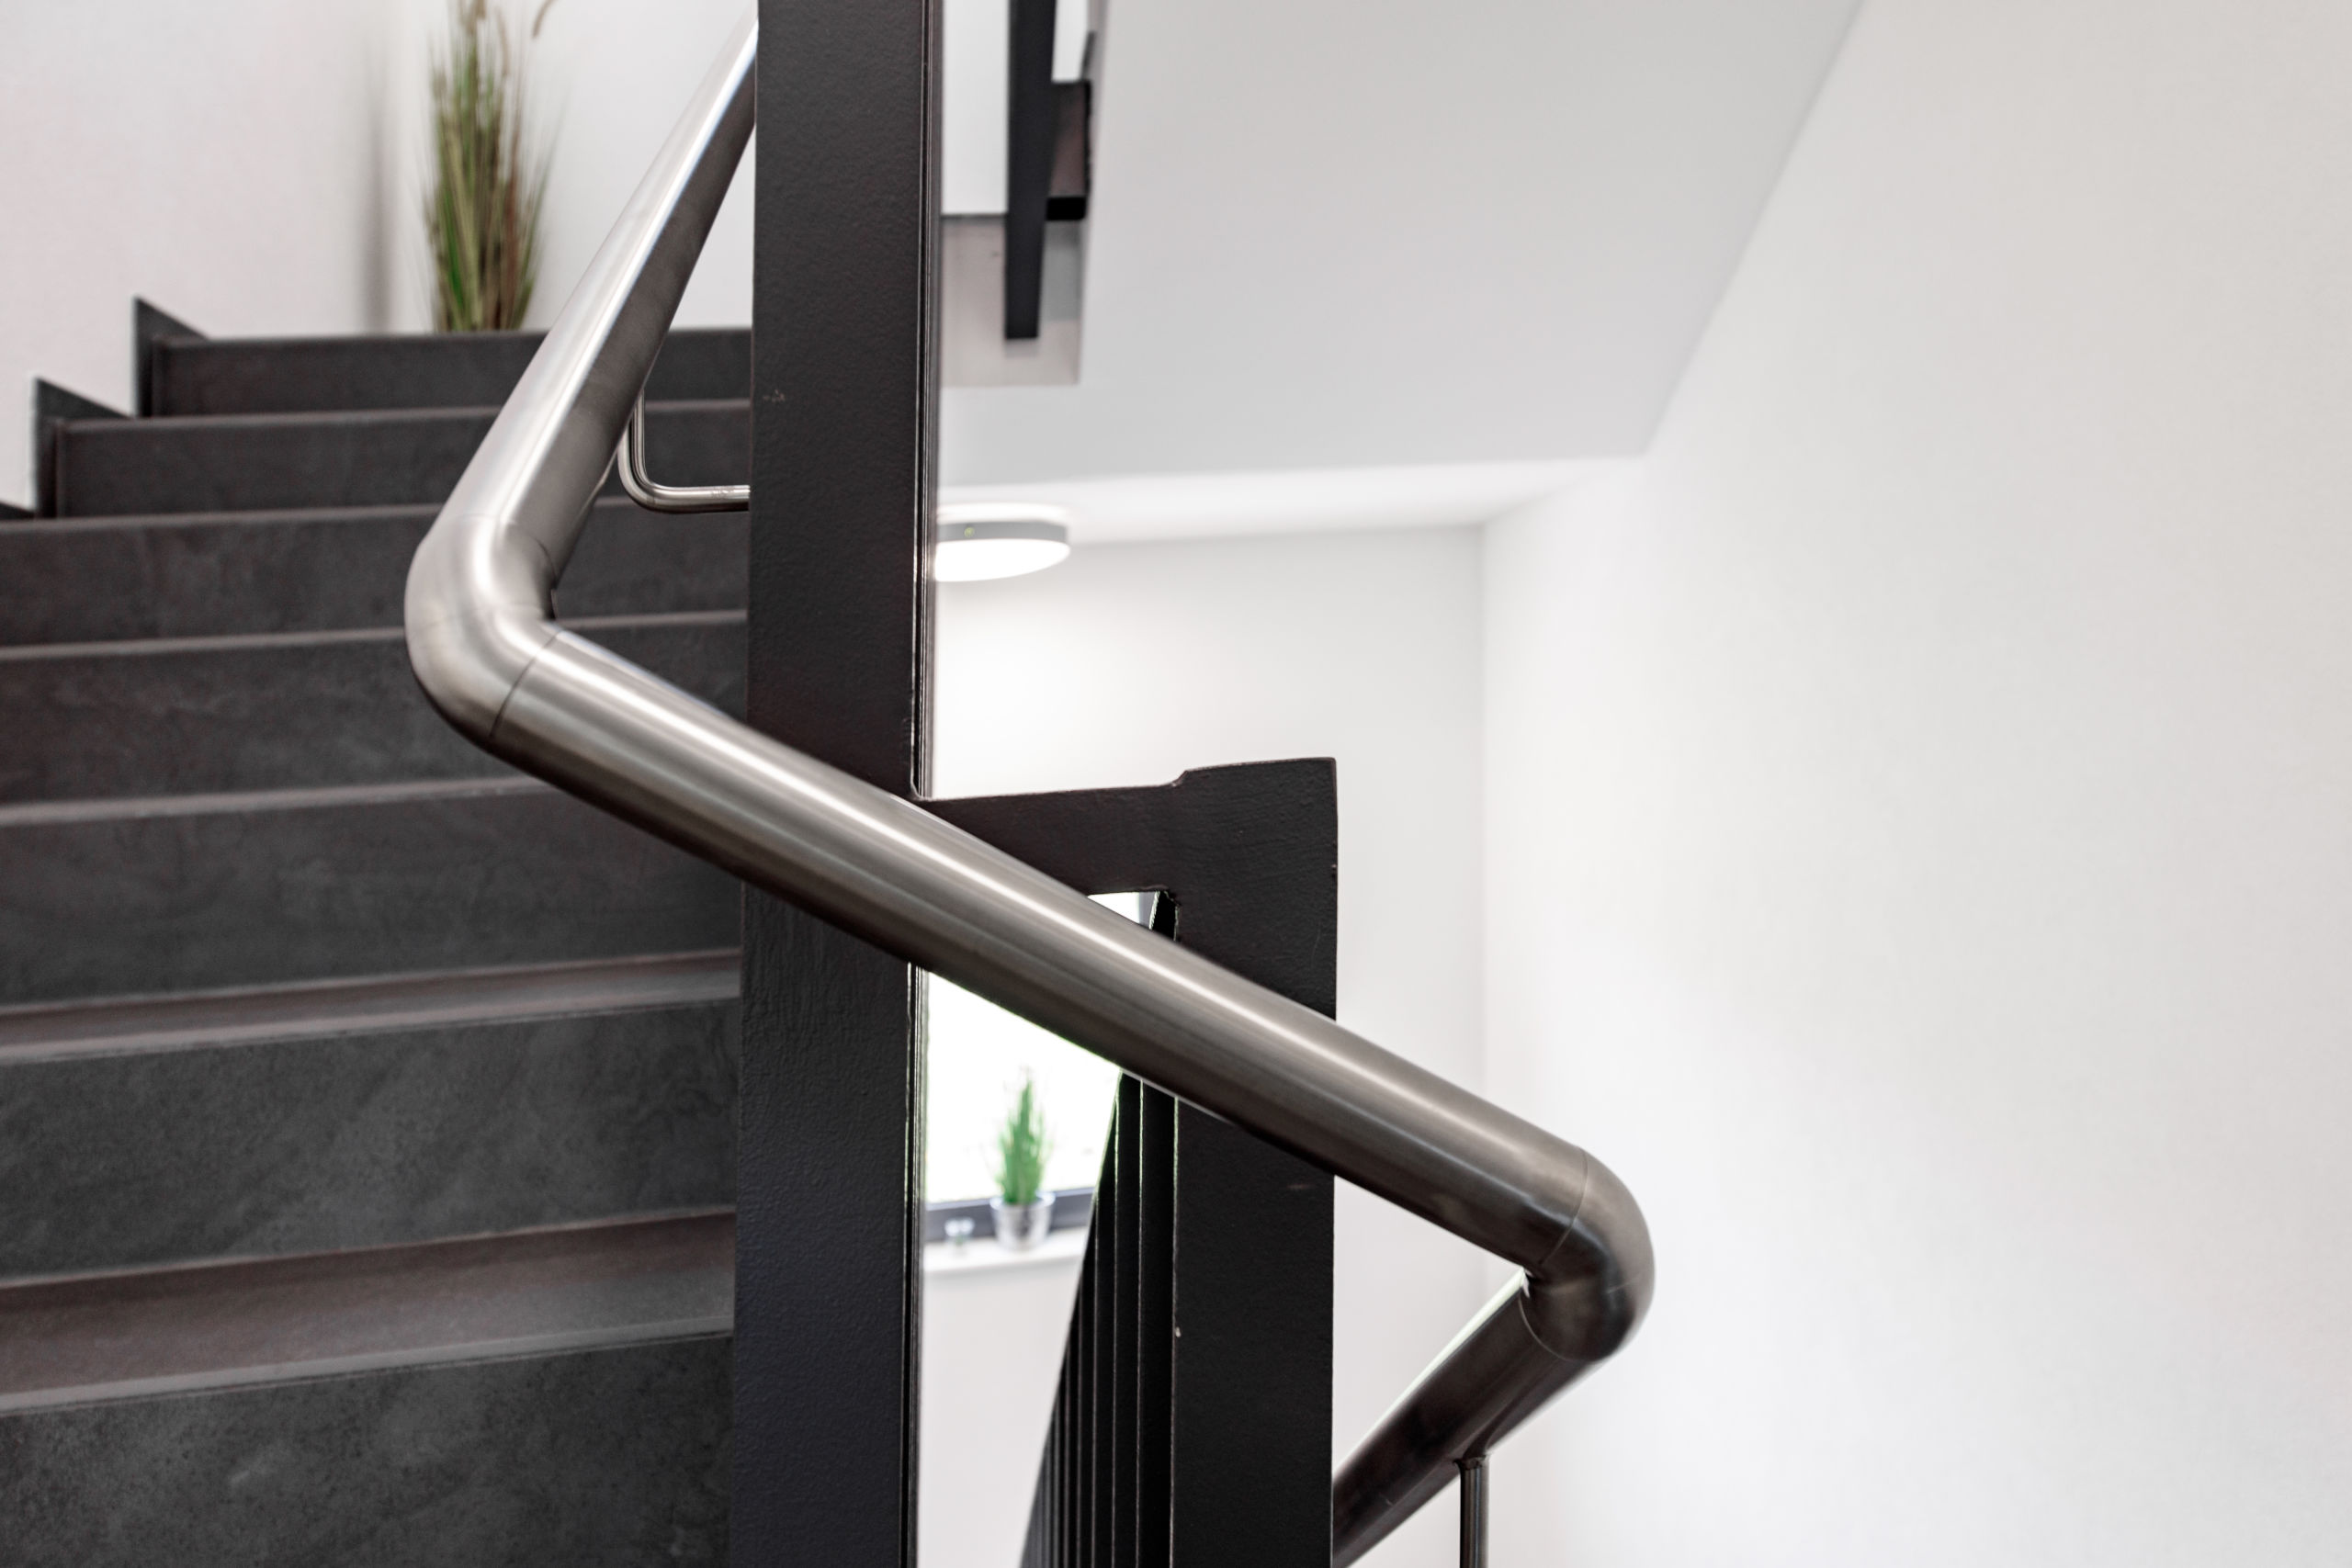 Schlosserarbeiten-Metallbauarbeiten-Treppen-Geländer-Carport-Schlosser- und Metallbauarbeiten